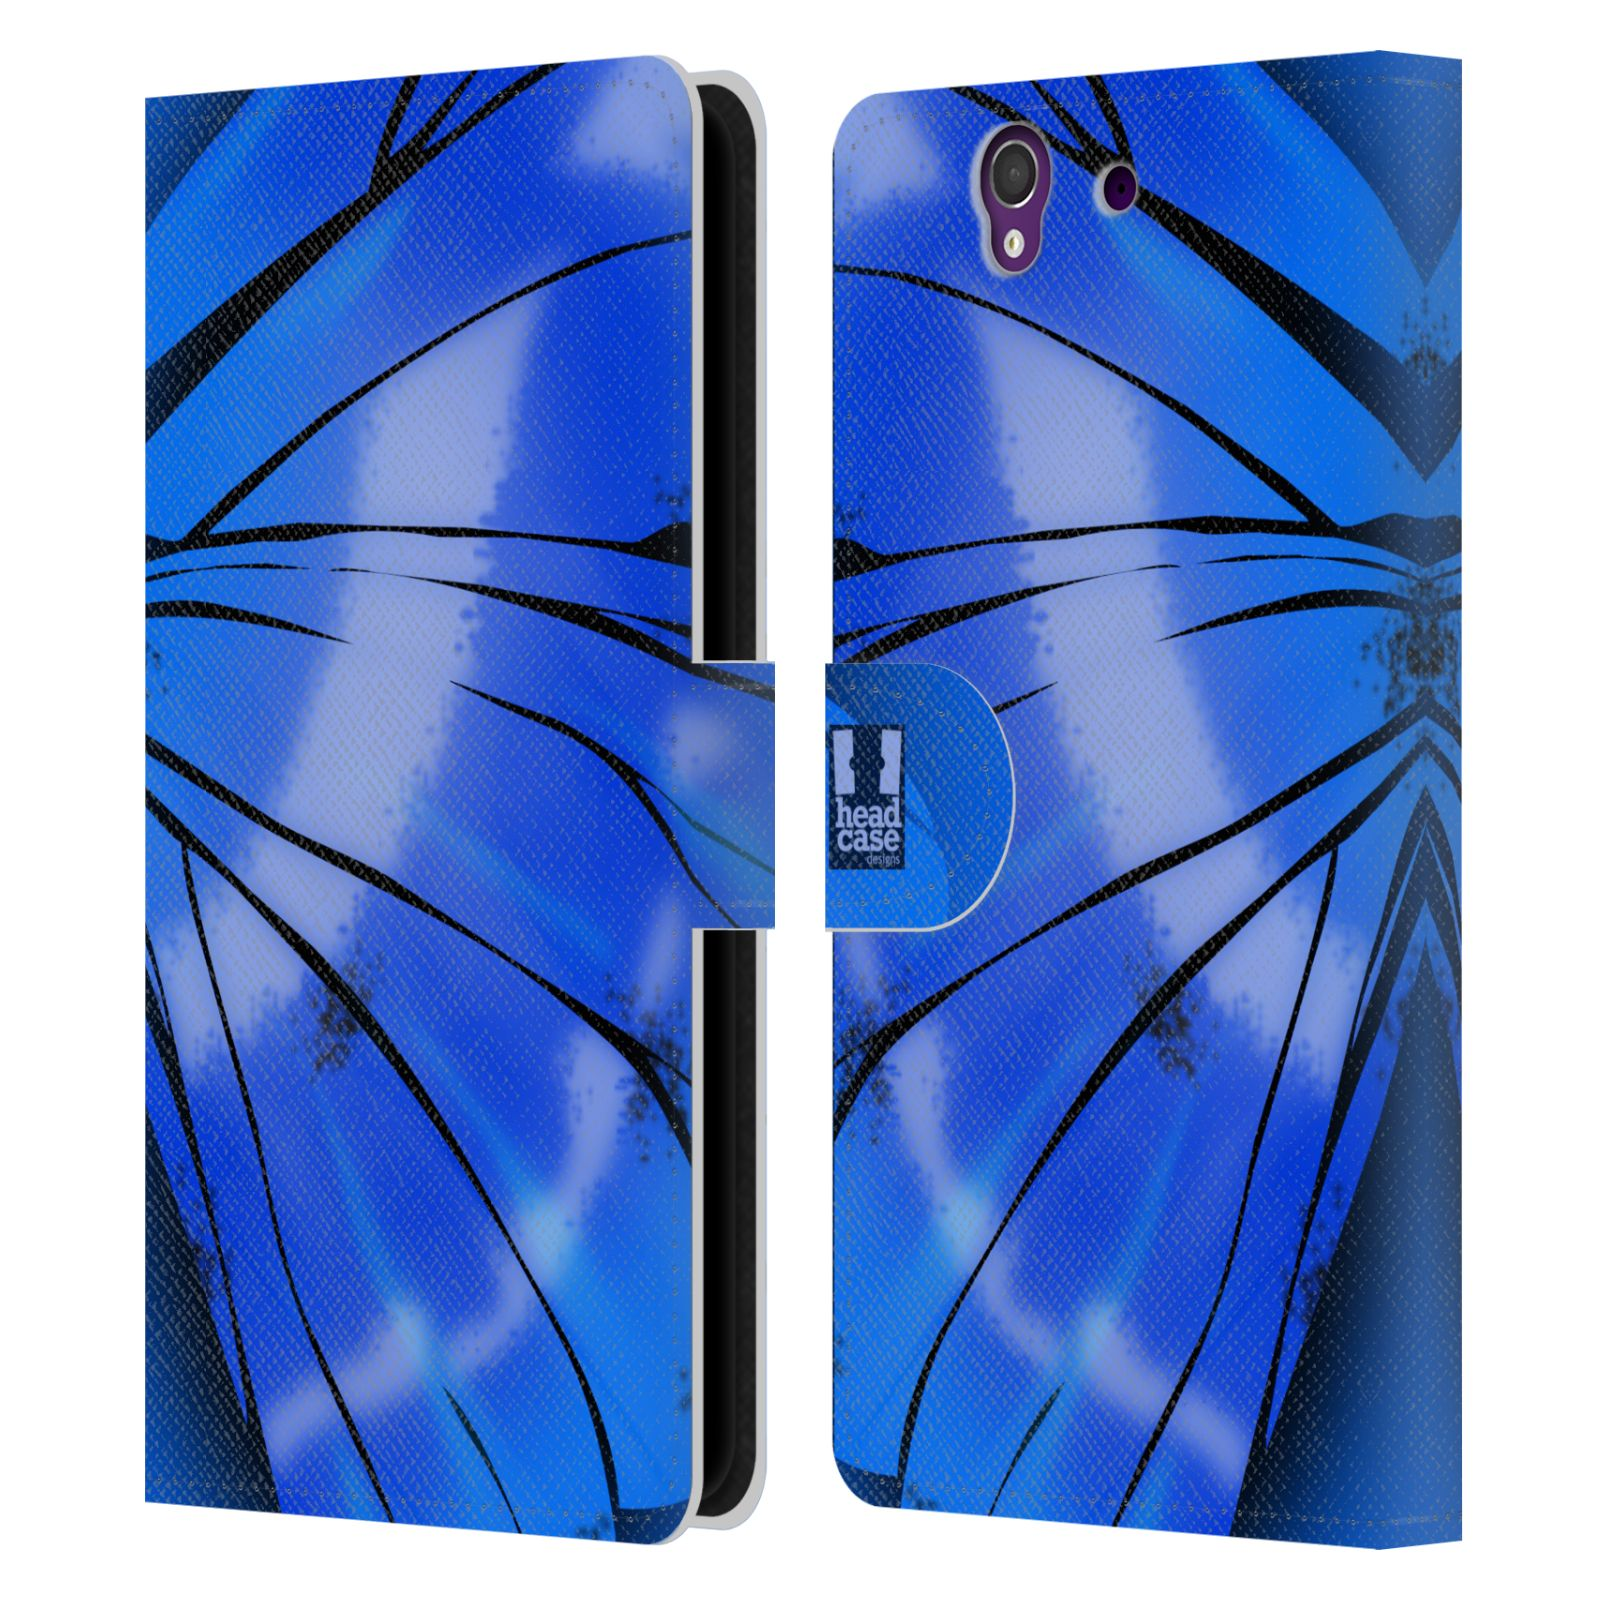 HEAD CASE Flipové pouzdro pro mobil SONY XPERIA Z (C6603) motýl a křídla kreslený vzor modrá zářivá